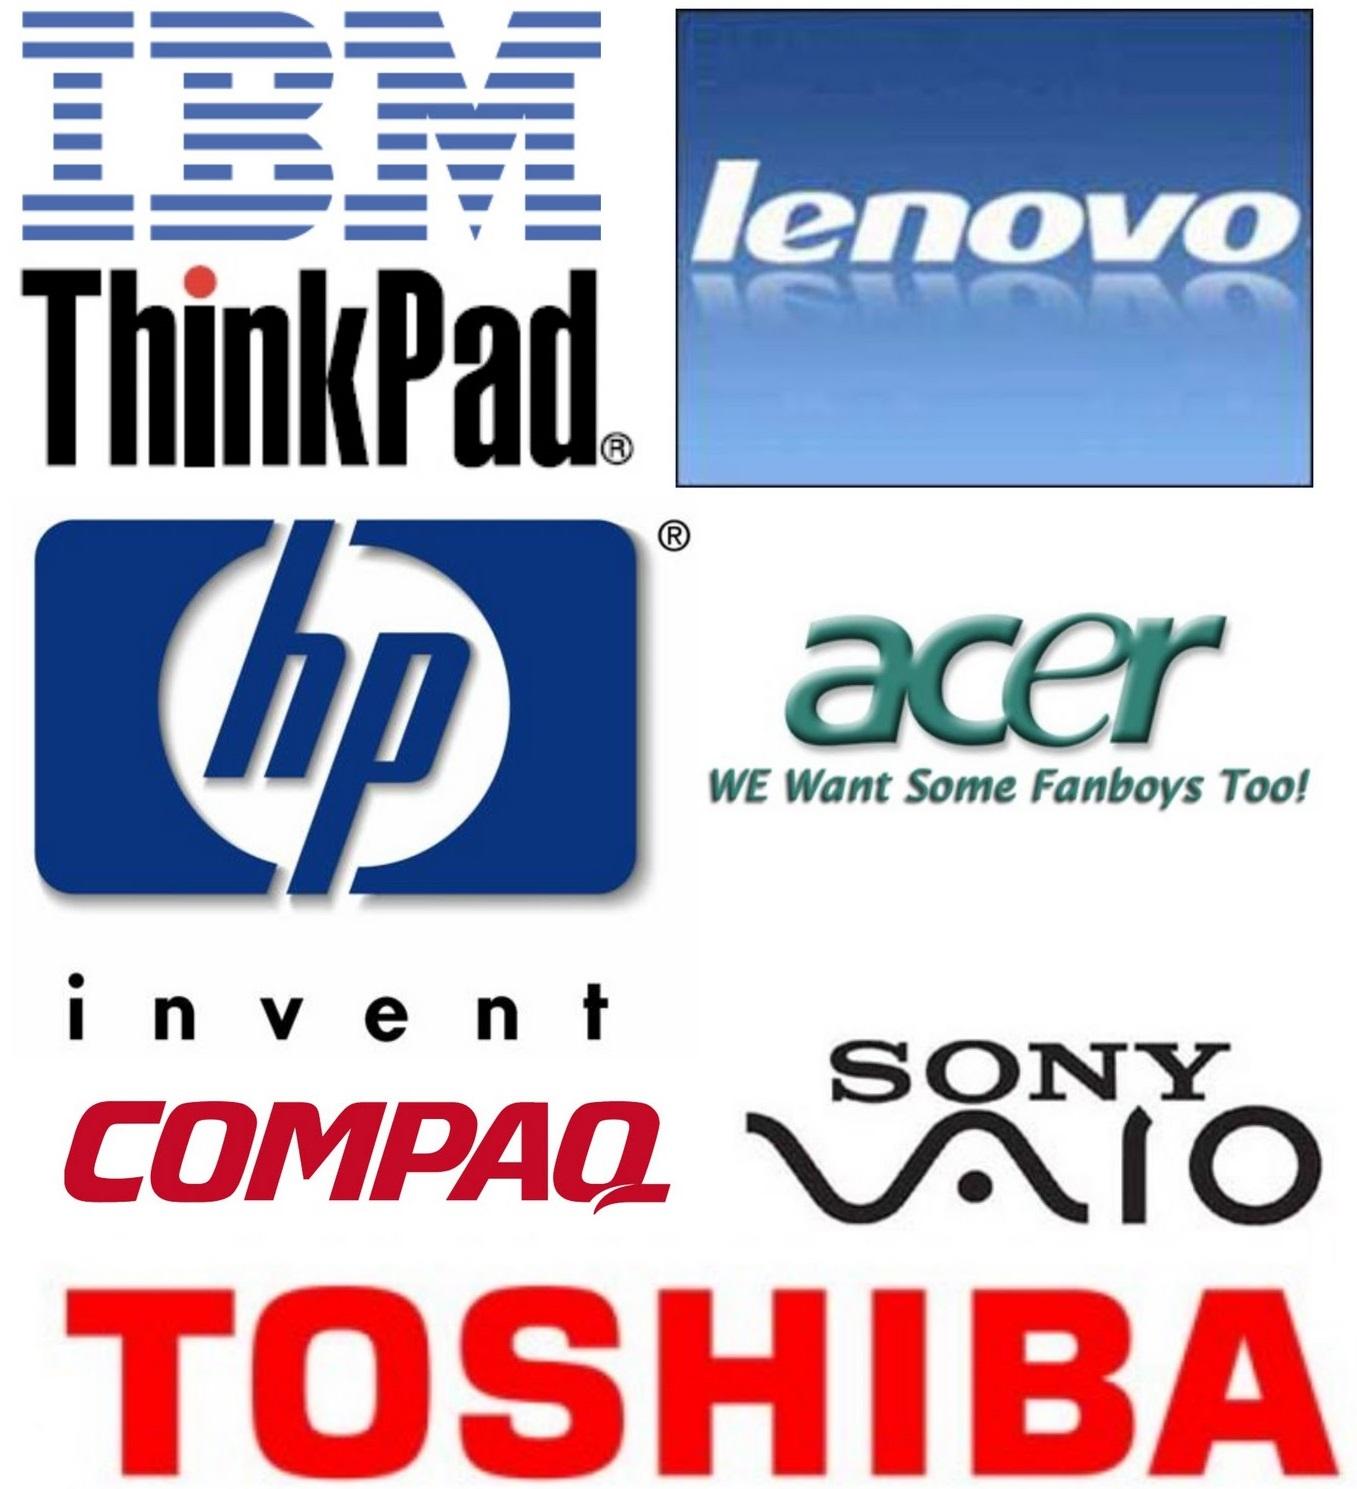 toshiba ct 90325 manual pdf